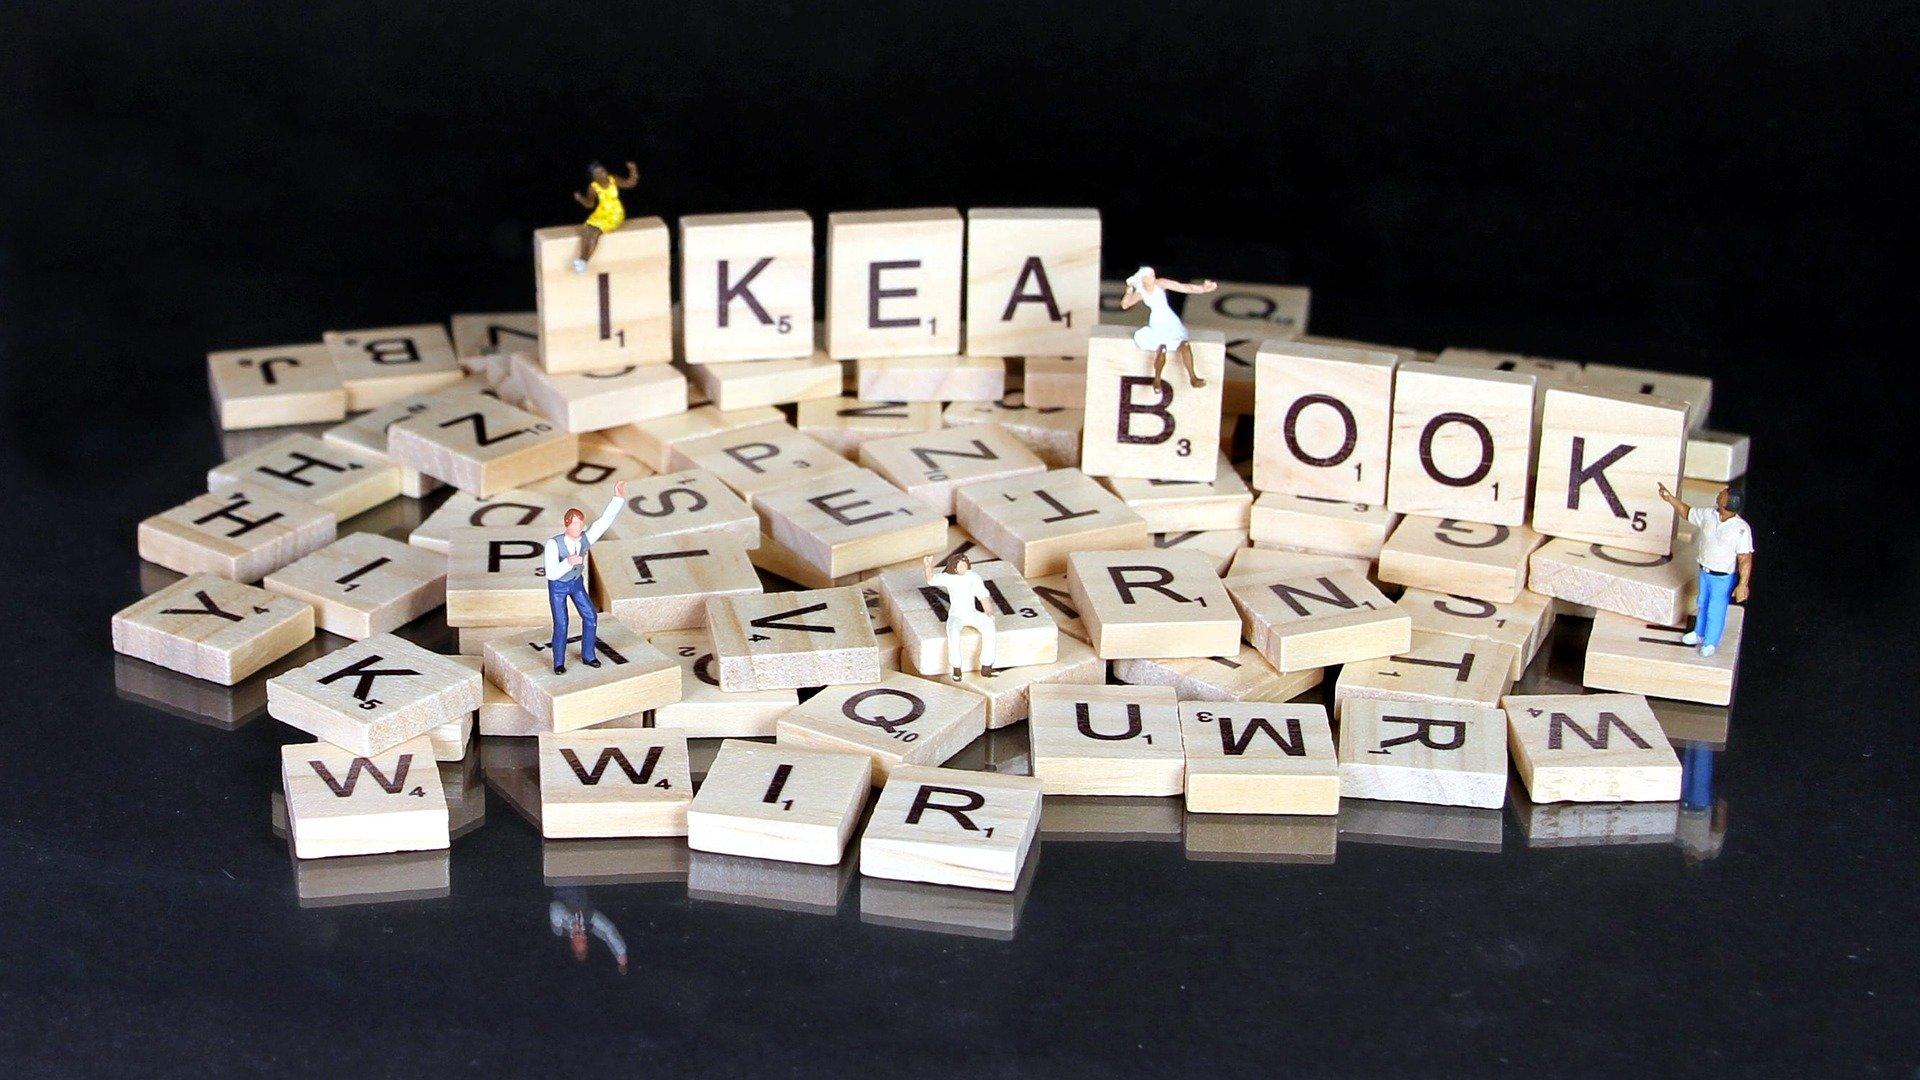 IKEA Kalatog in Steinen